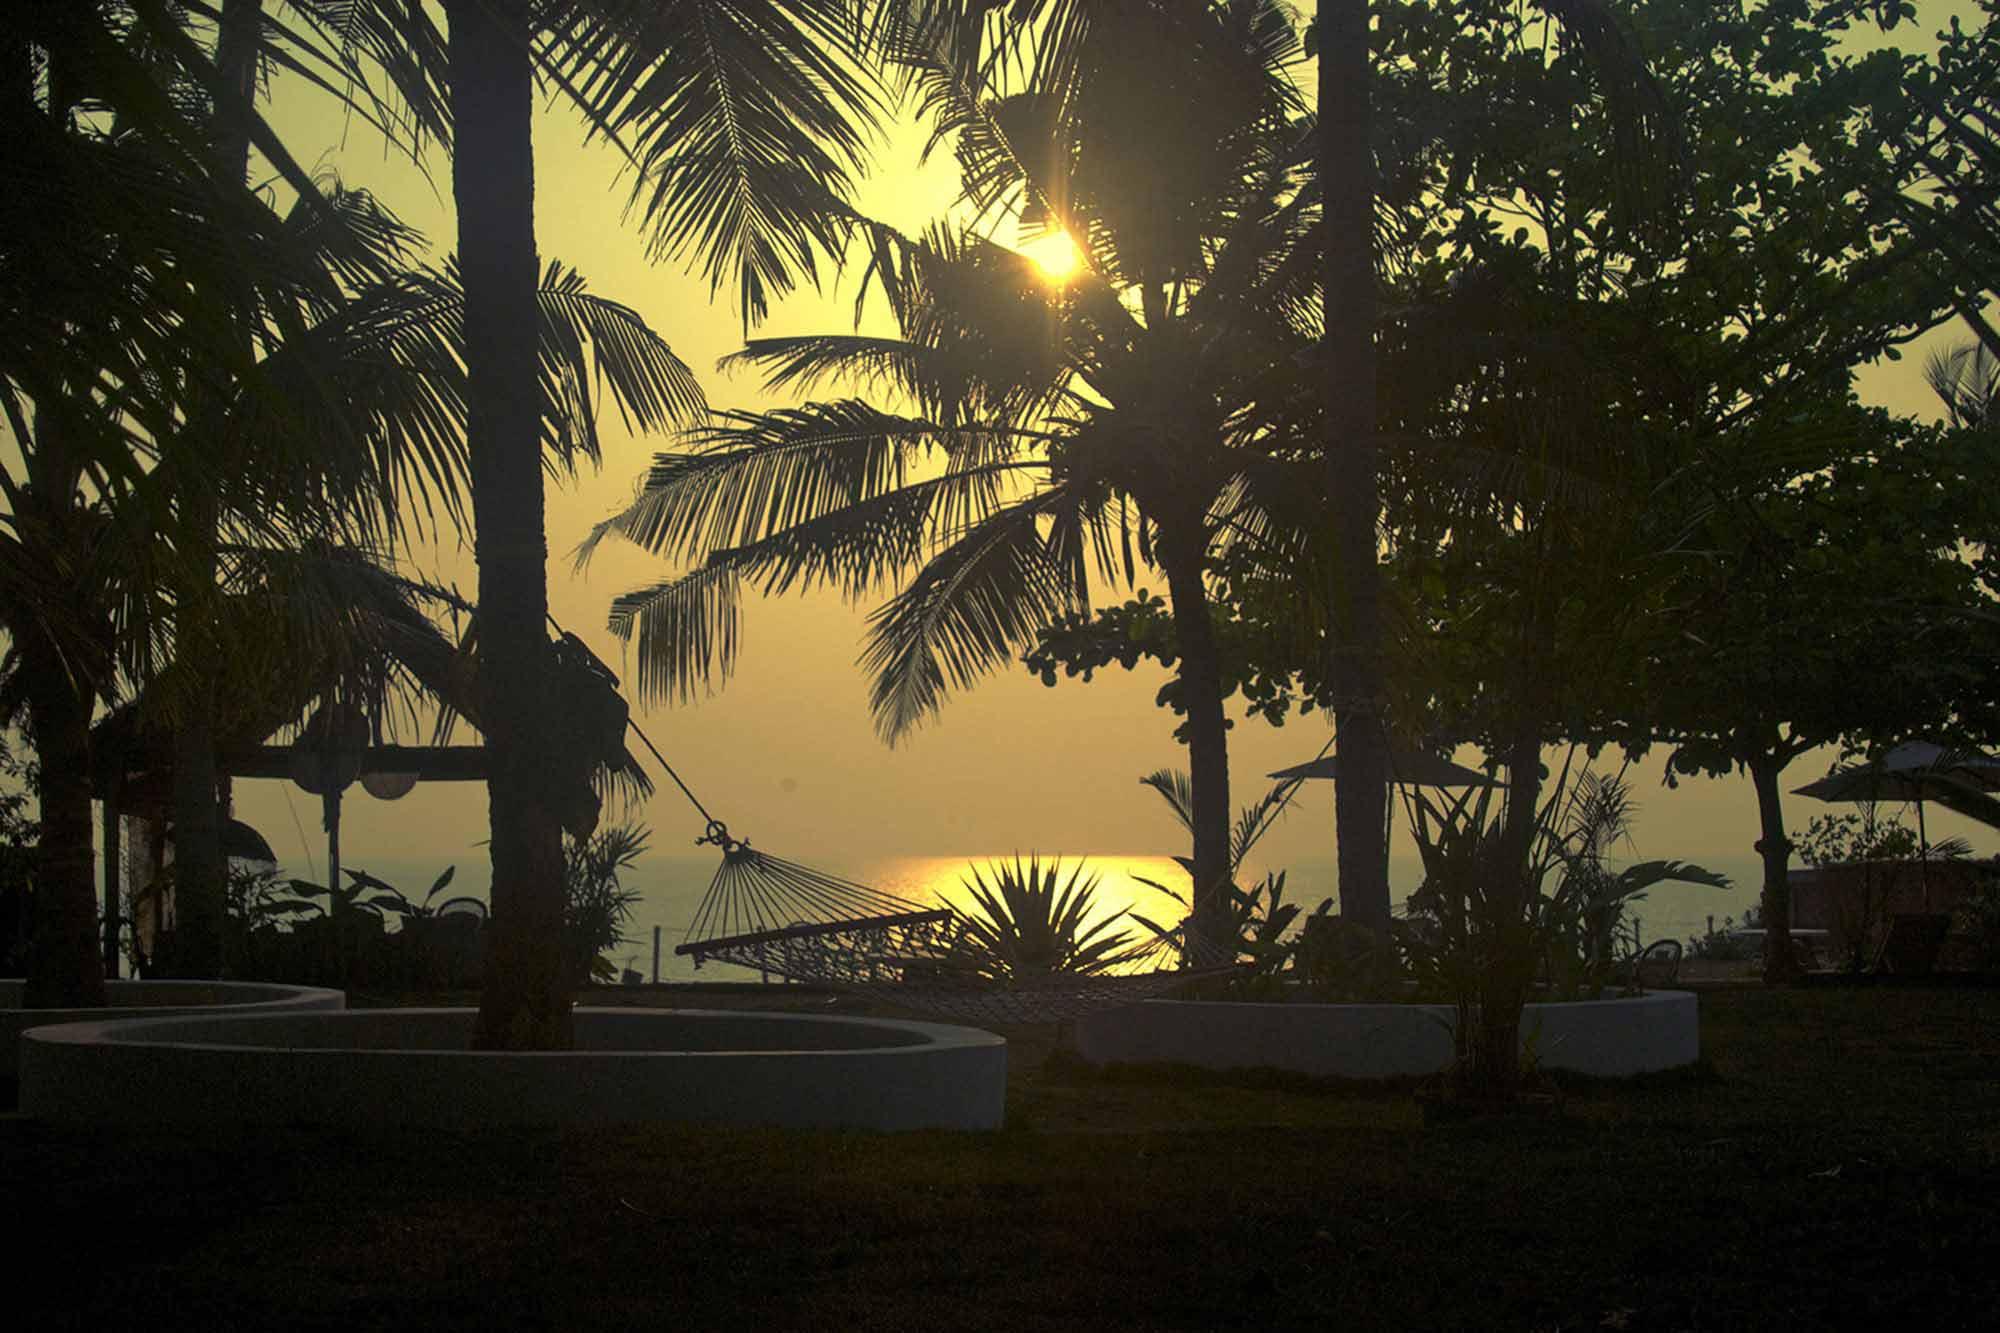 https://www.soulandsurf.com/wp-content/uploads/2021/09/Retreatsindia-images-SoulSurf-13.jpg